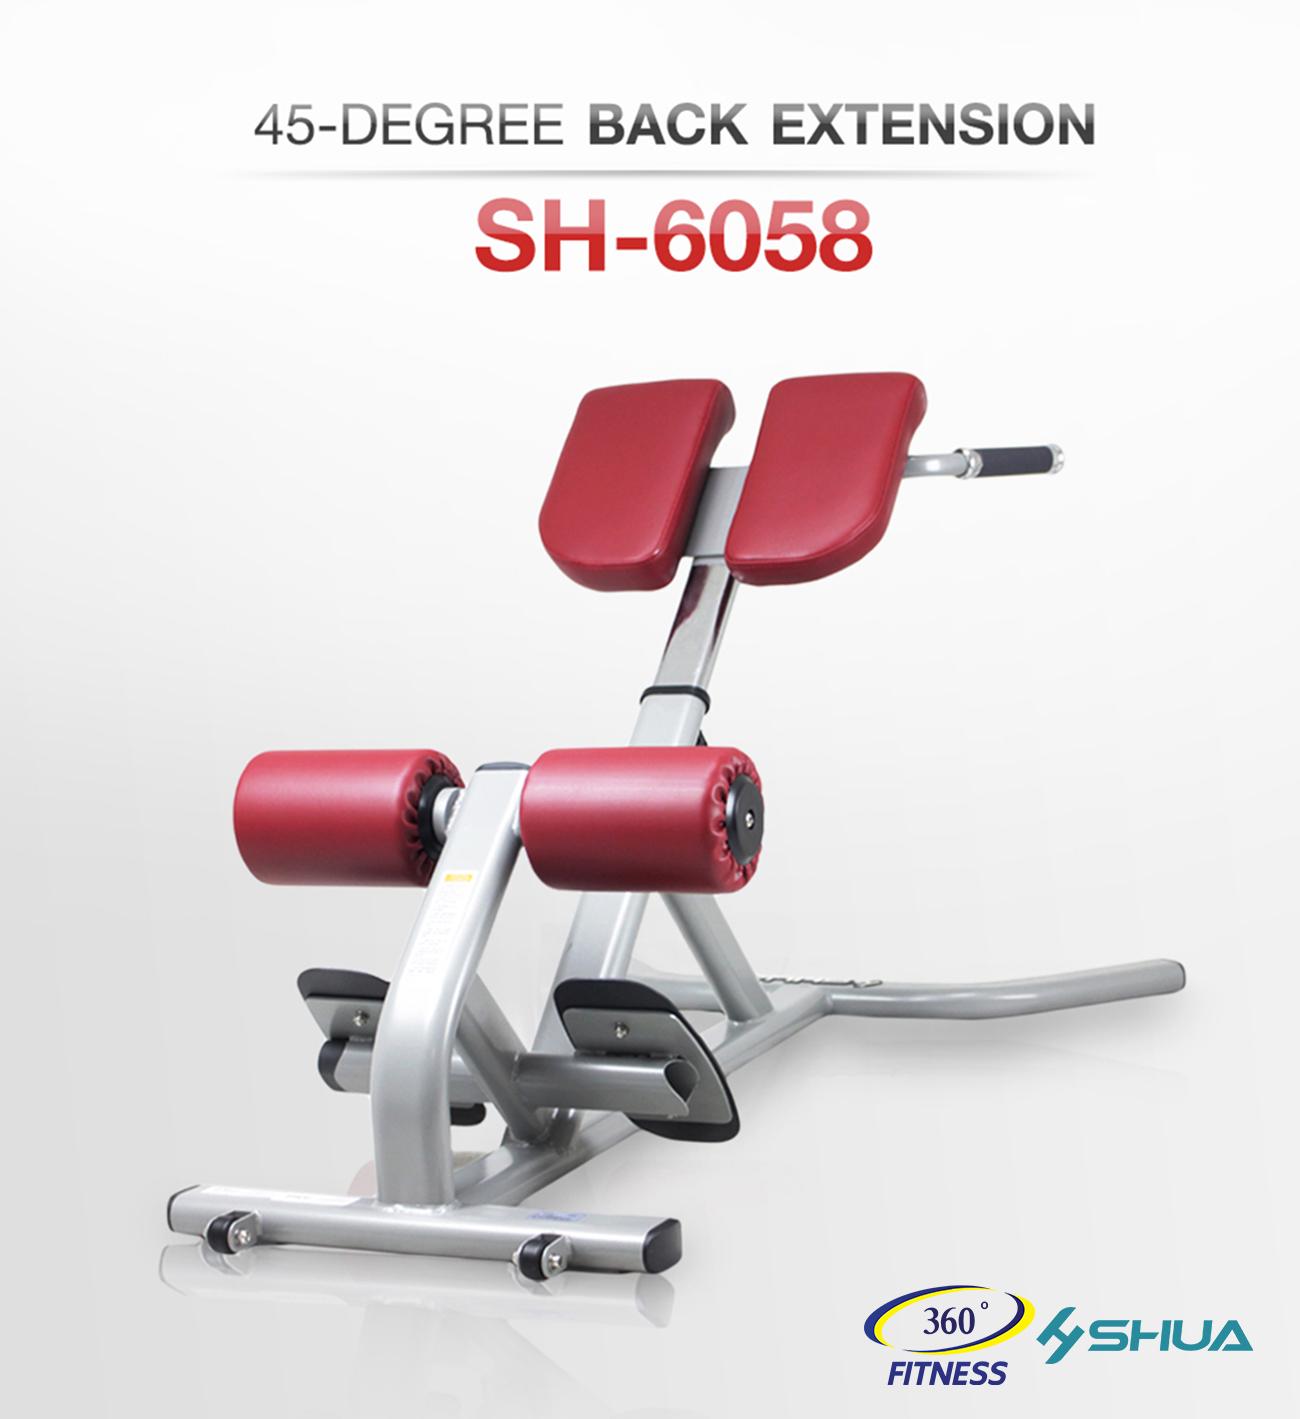 45-DEGREE BACK EXTENSION SH-6058